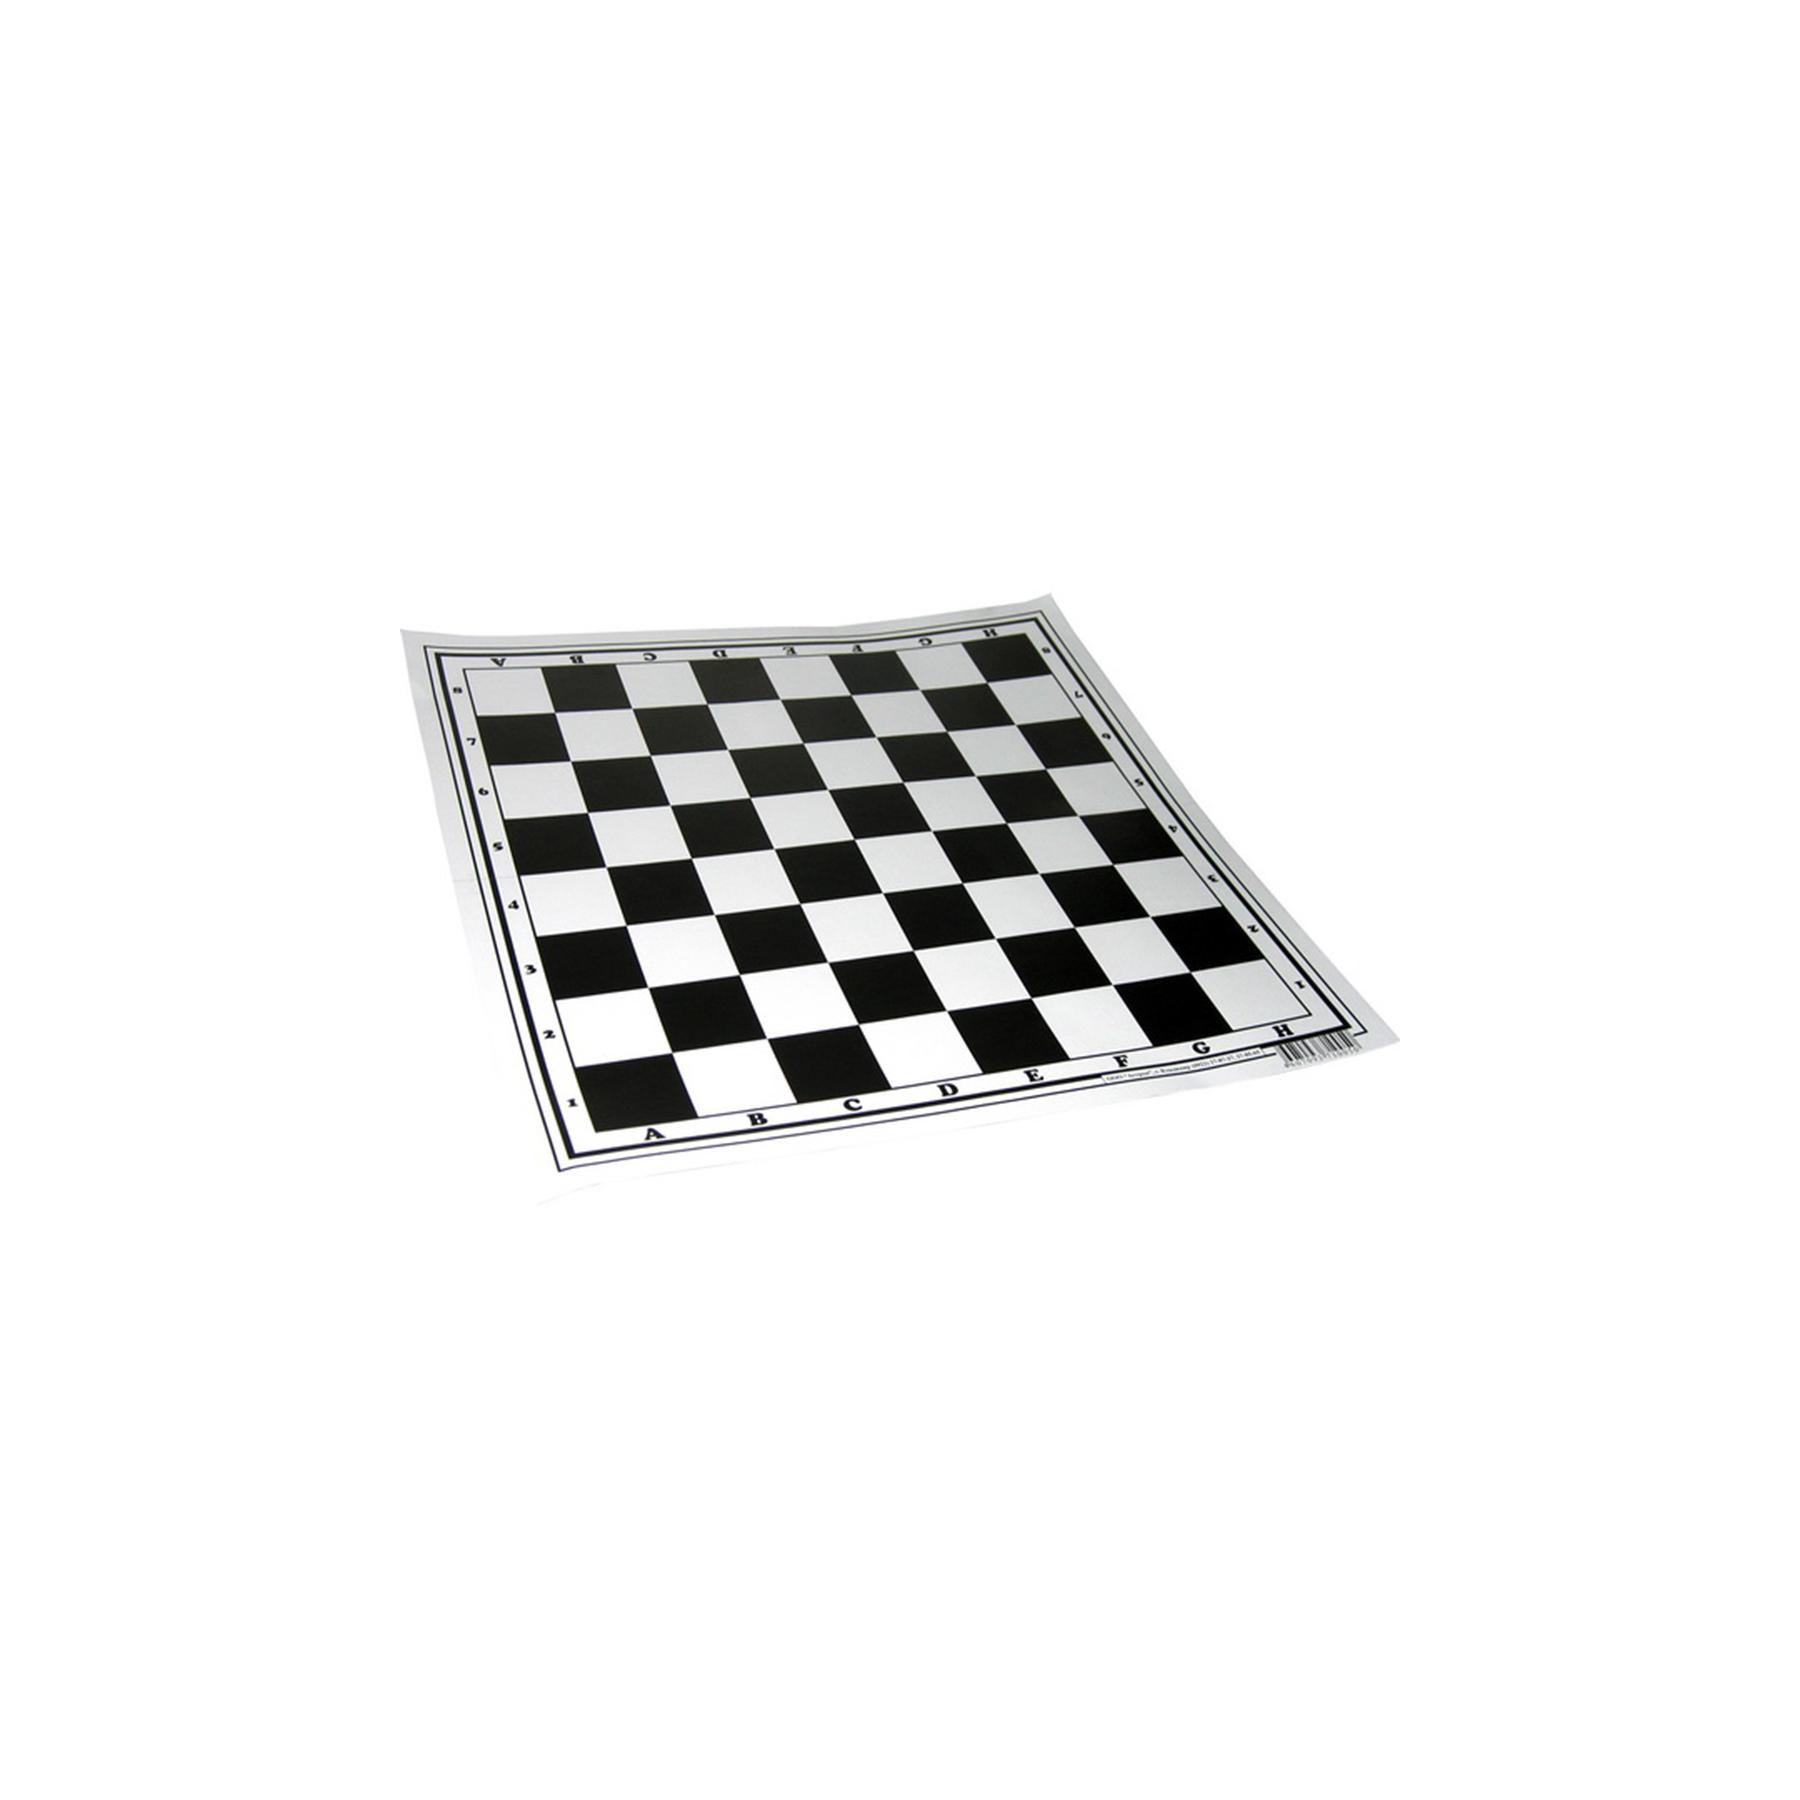 Доска шахматная Астрон (картон) 02-04